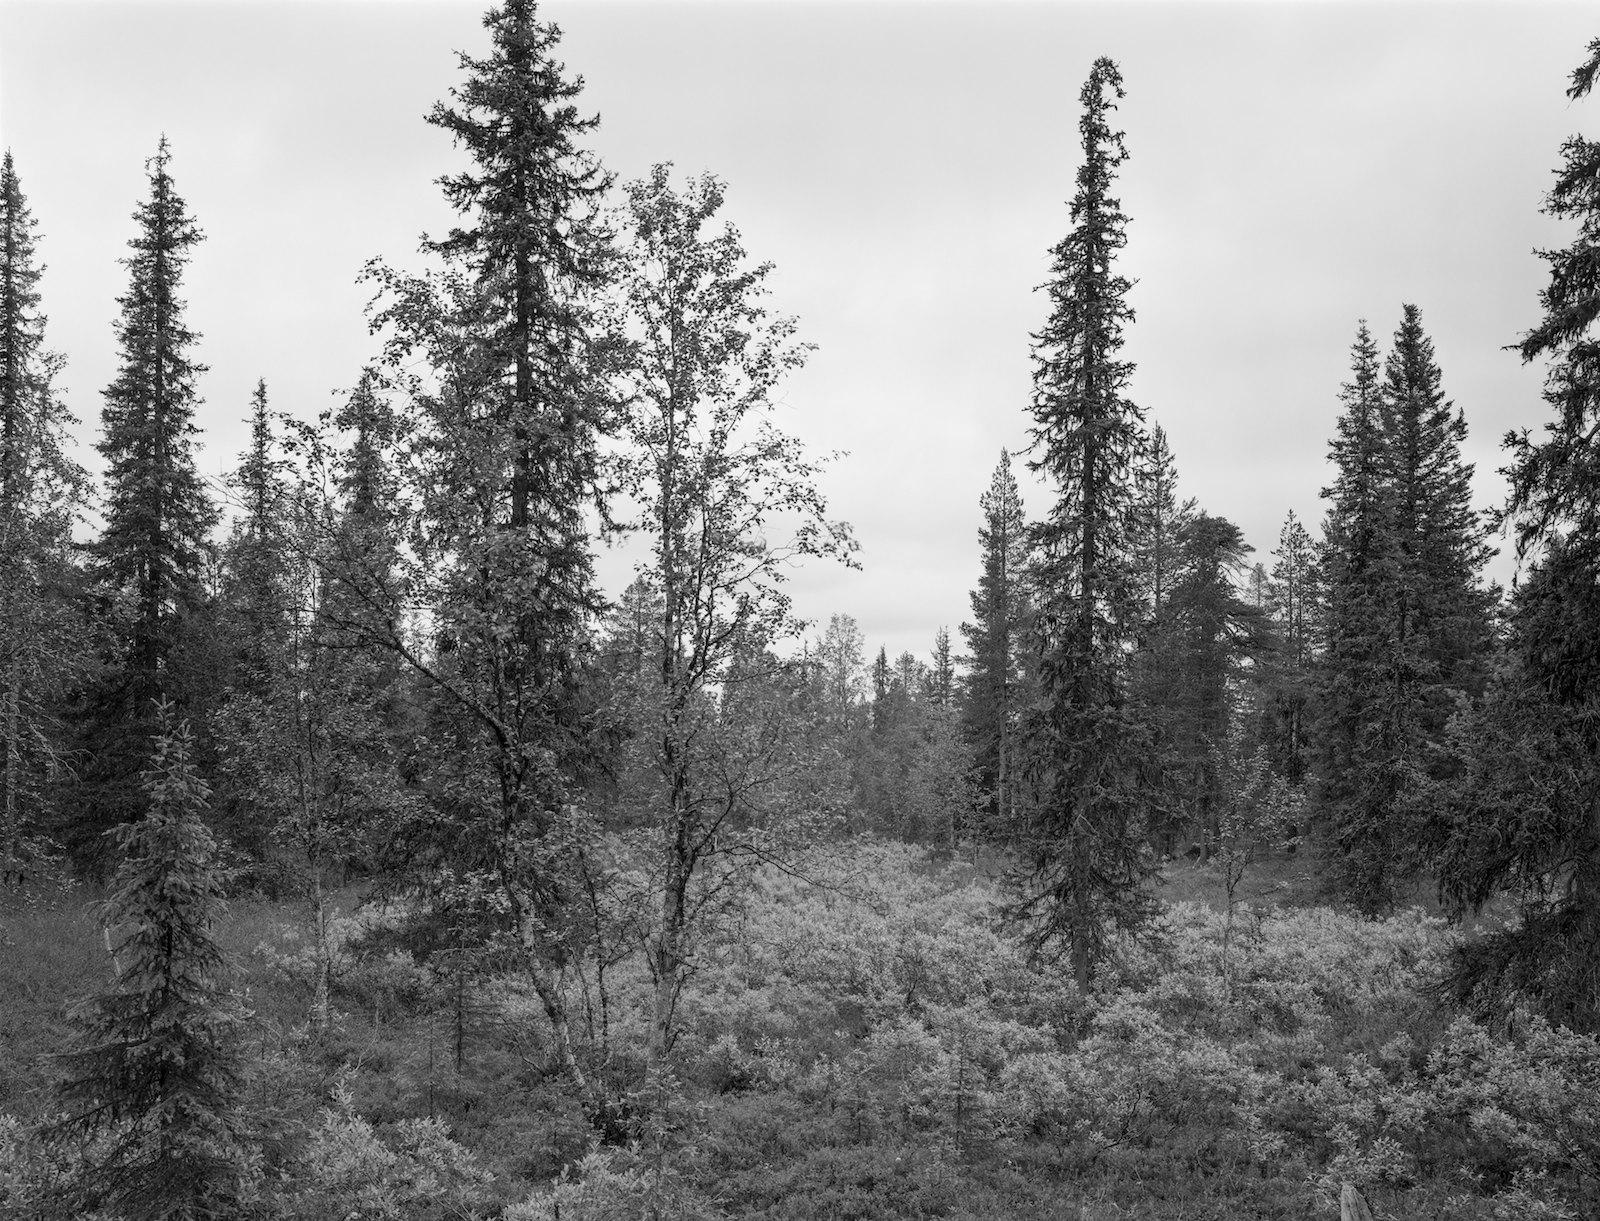 Metsä 82, Lismantie, Inari, Finland, 2013, ink-jet print on baryta paper, 74 x 97 cm